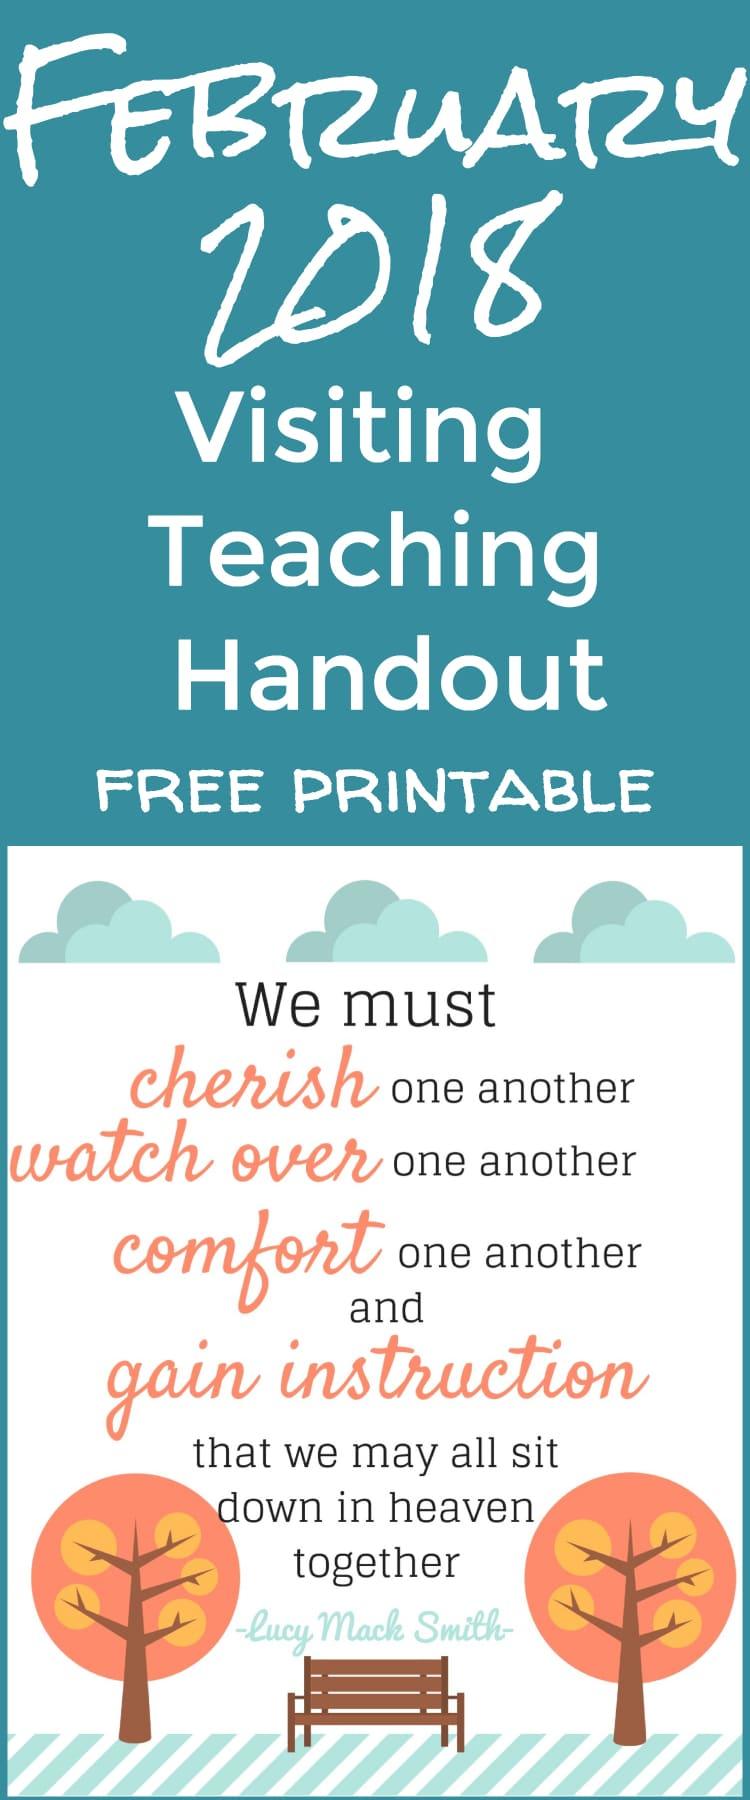 2018 visiting teaching printable / visiting teaching handout / visiting teaching ideas / lds ideas / mormon / relief society via @clarkscondensed